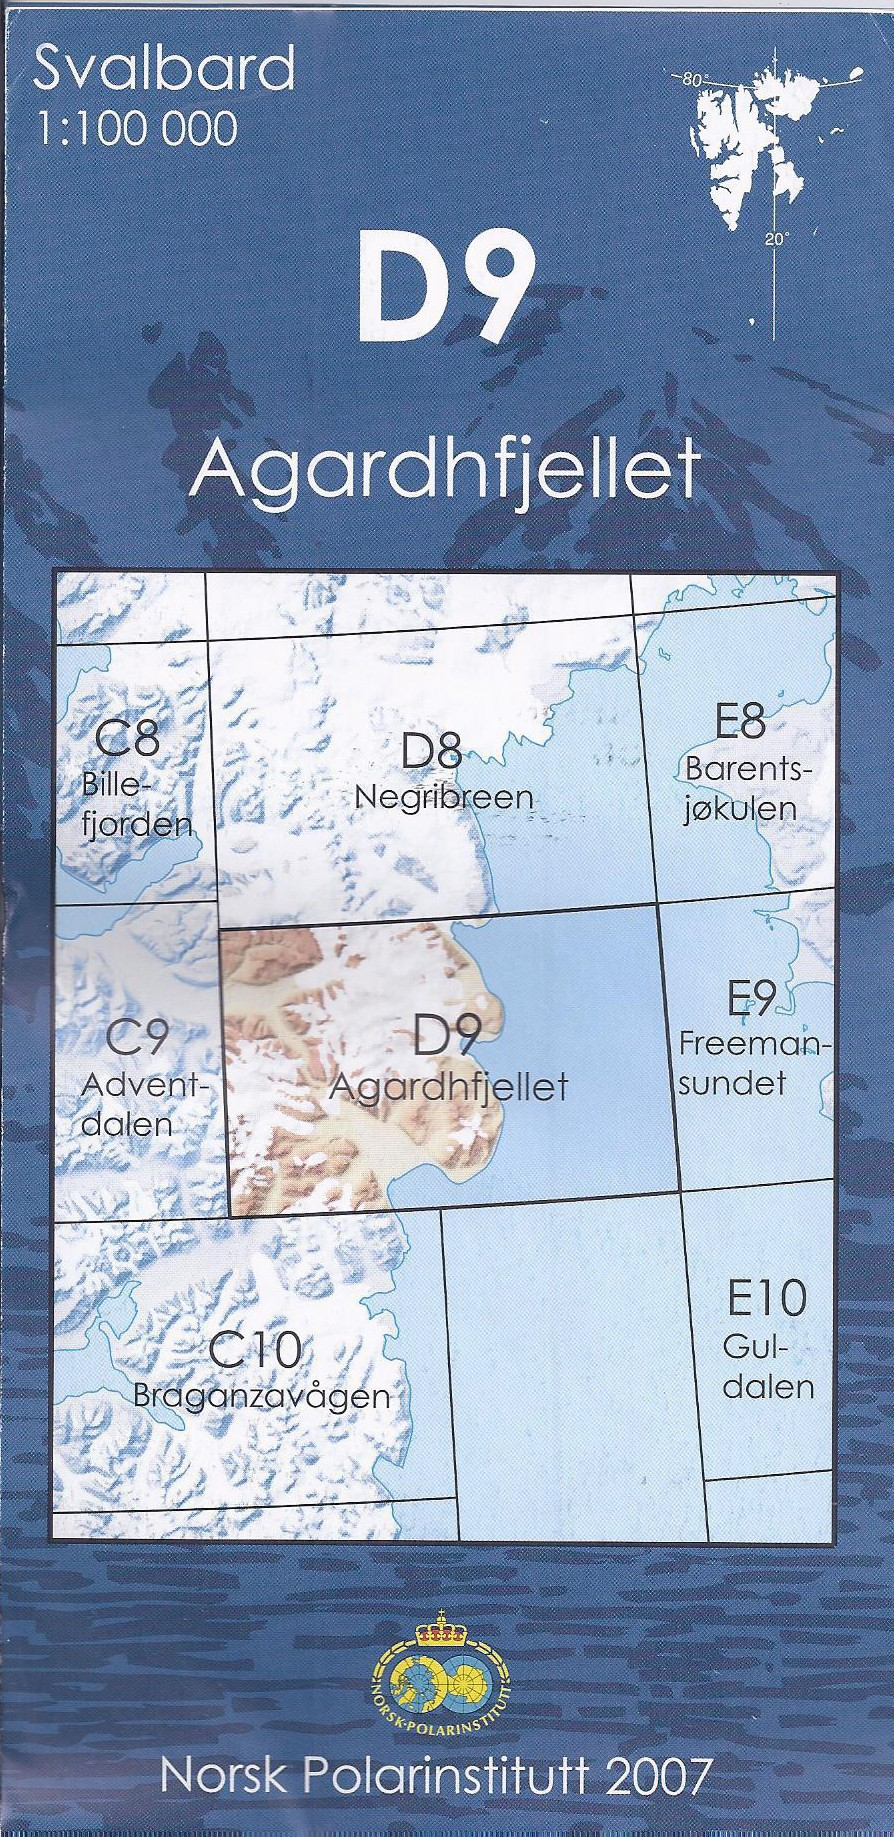 D9 Agardhfjellet 1:100 000